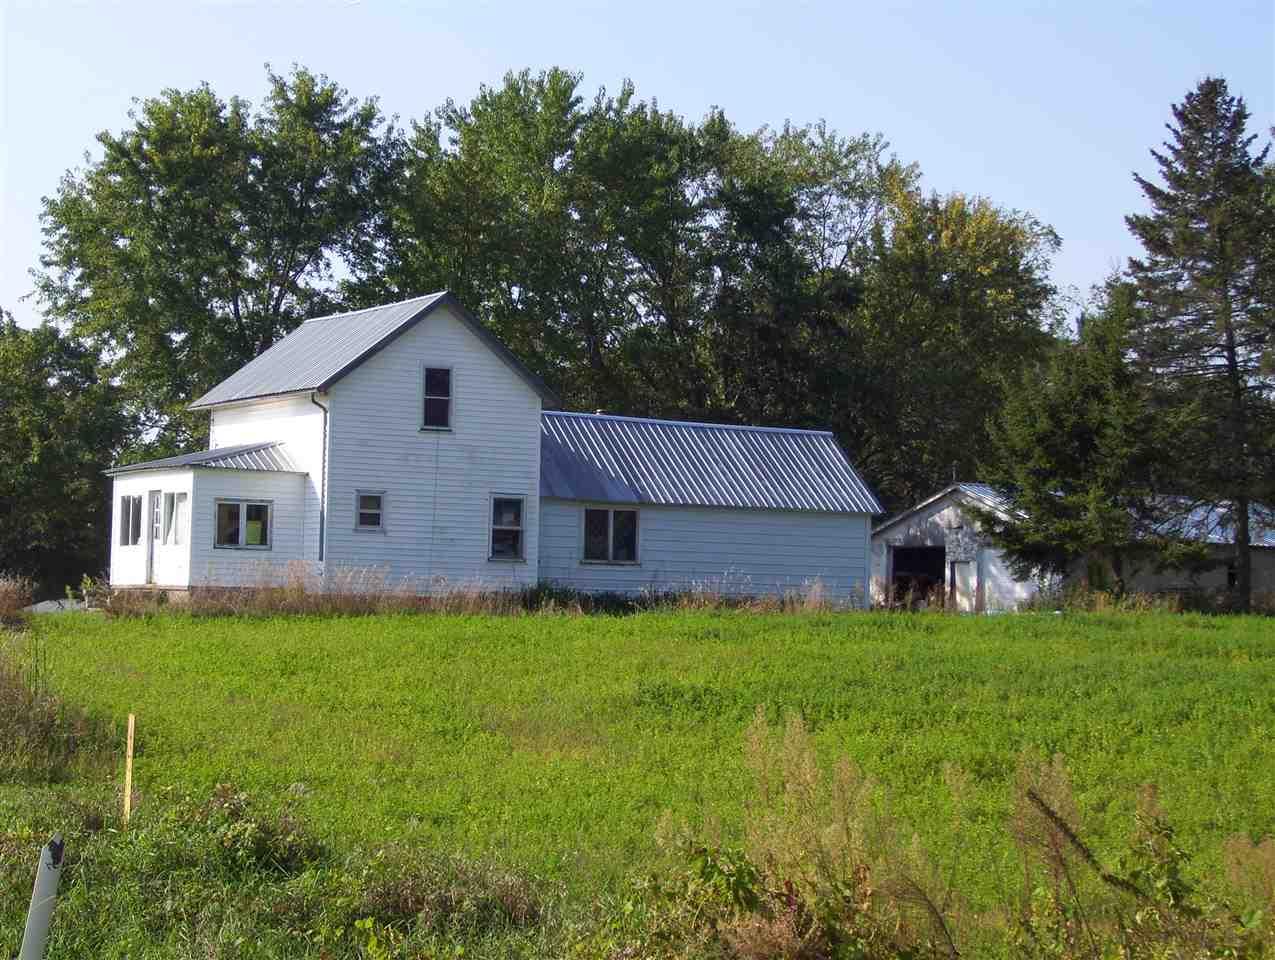 N827 County Road FF, Kingston, WI 53926